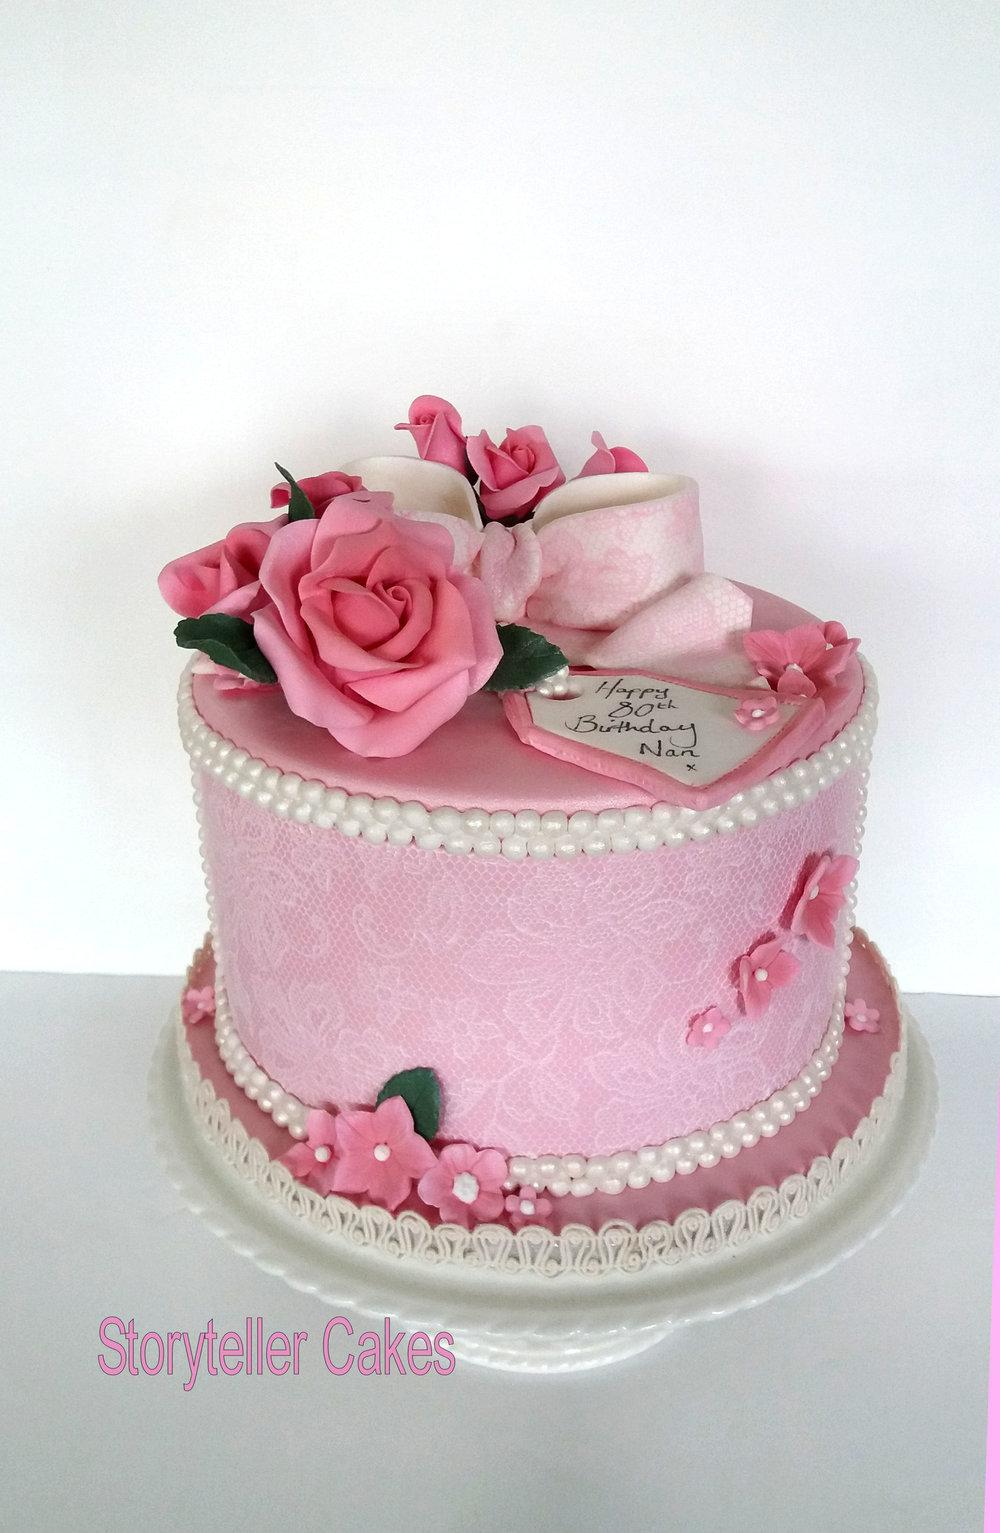 rose cake 1.jpg